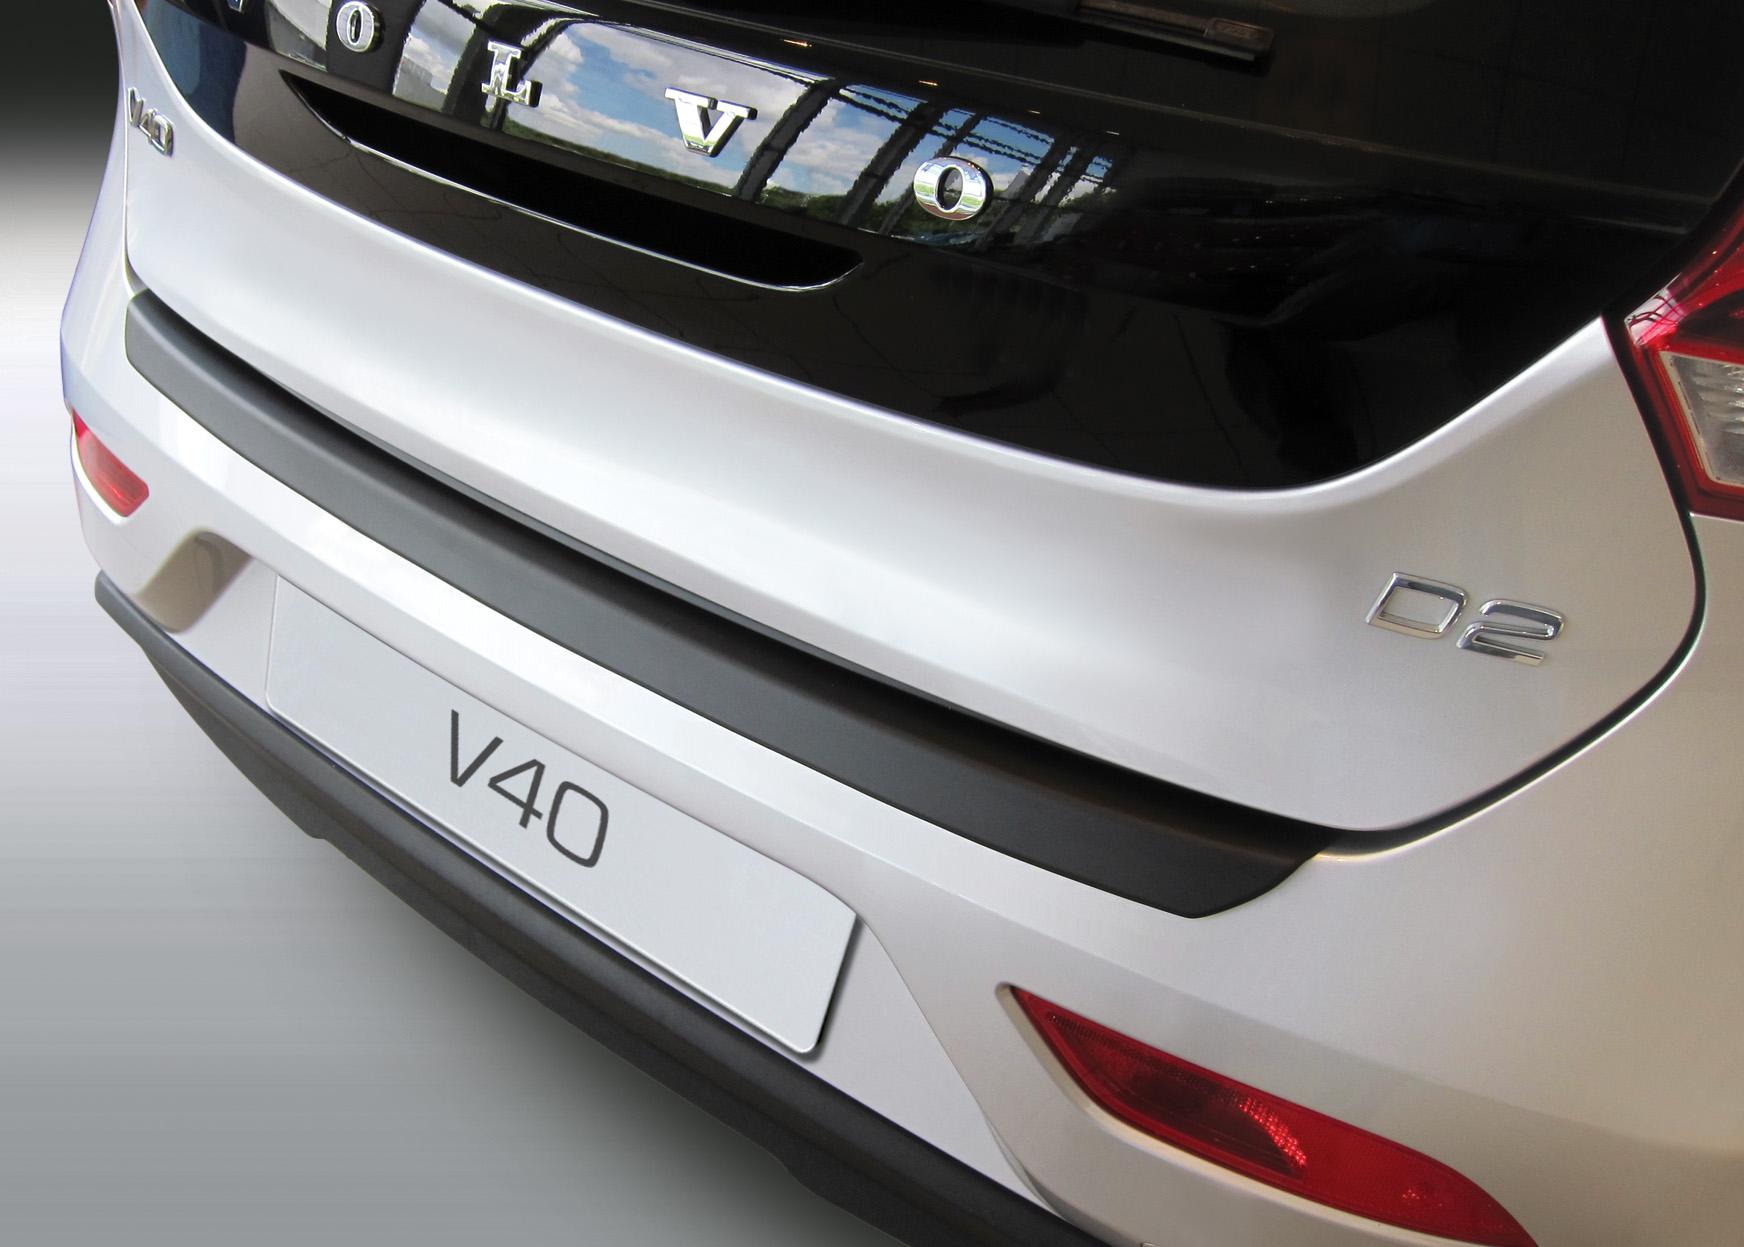 Накладка на задний бампер Volvo V40, 2012-н.в.